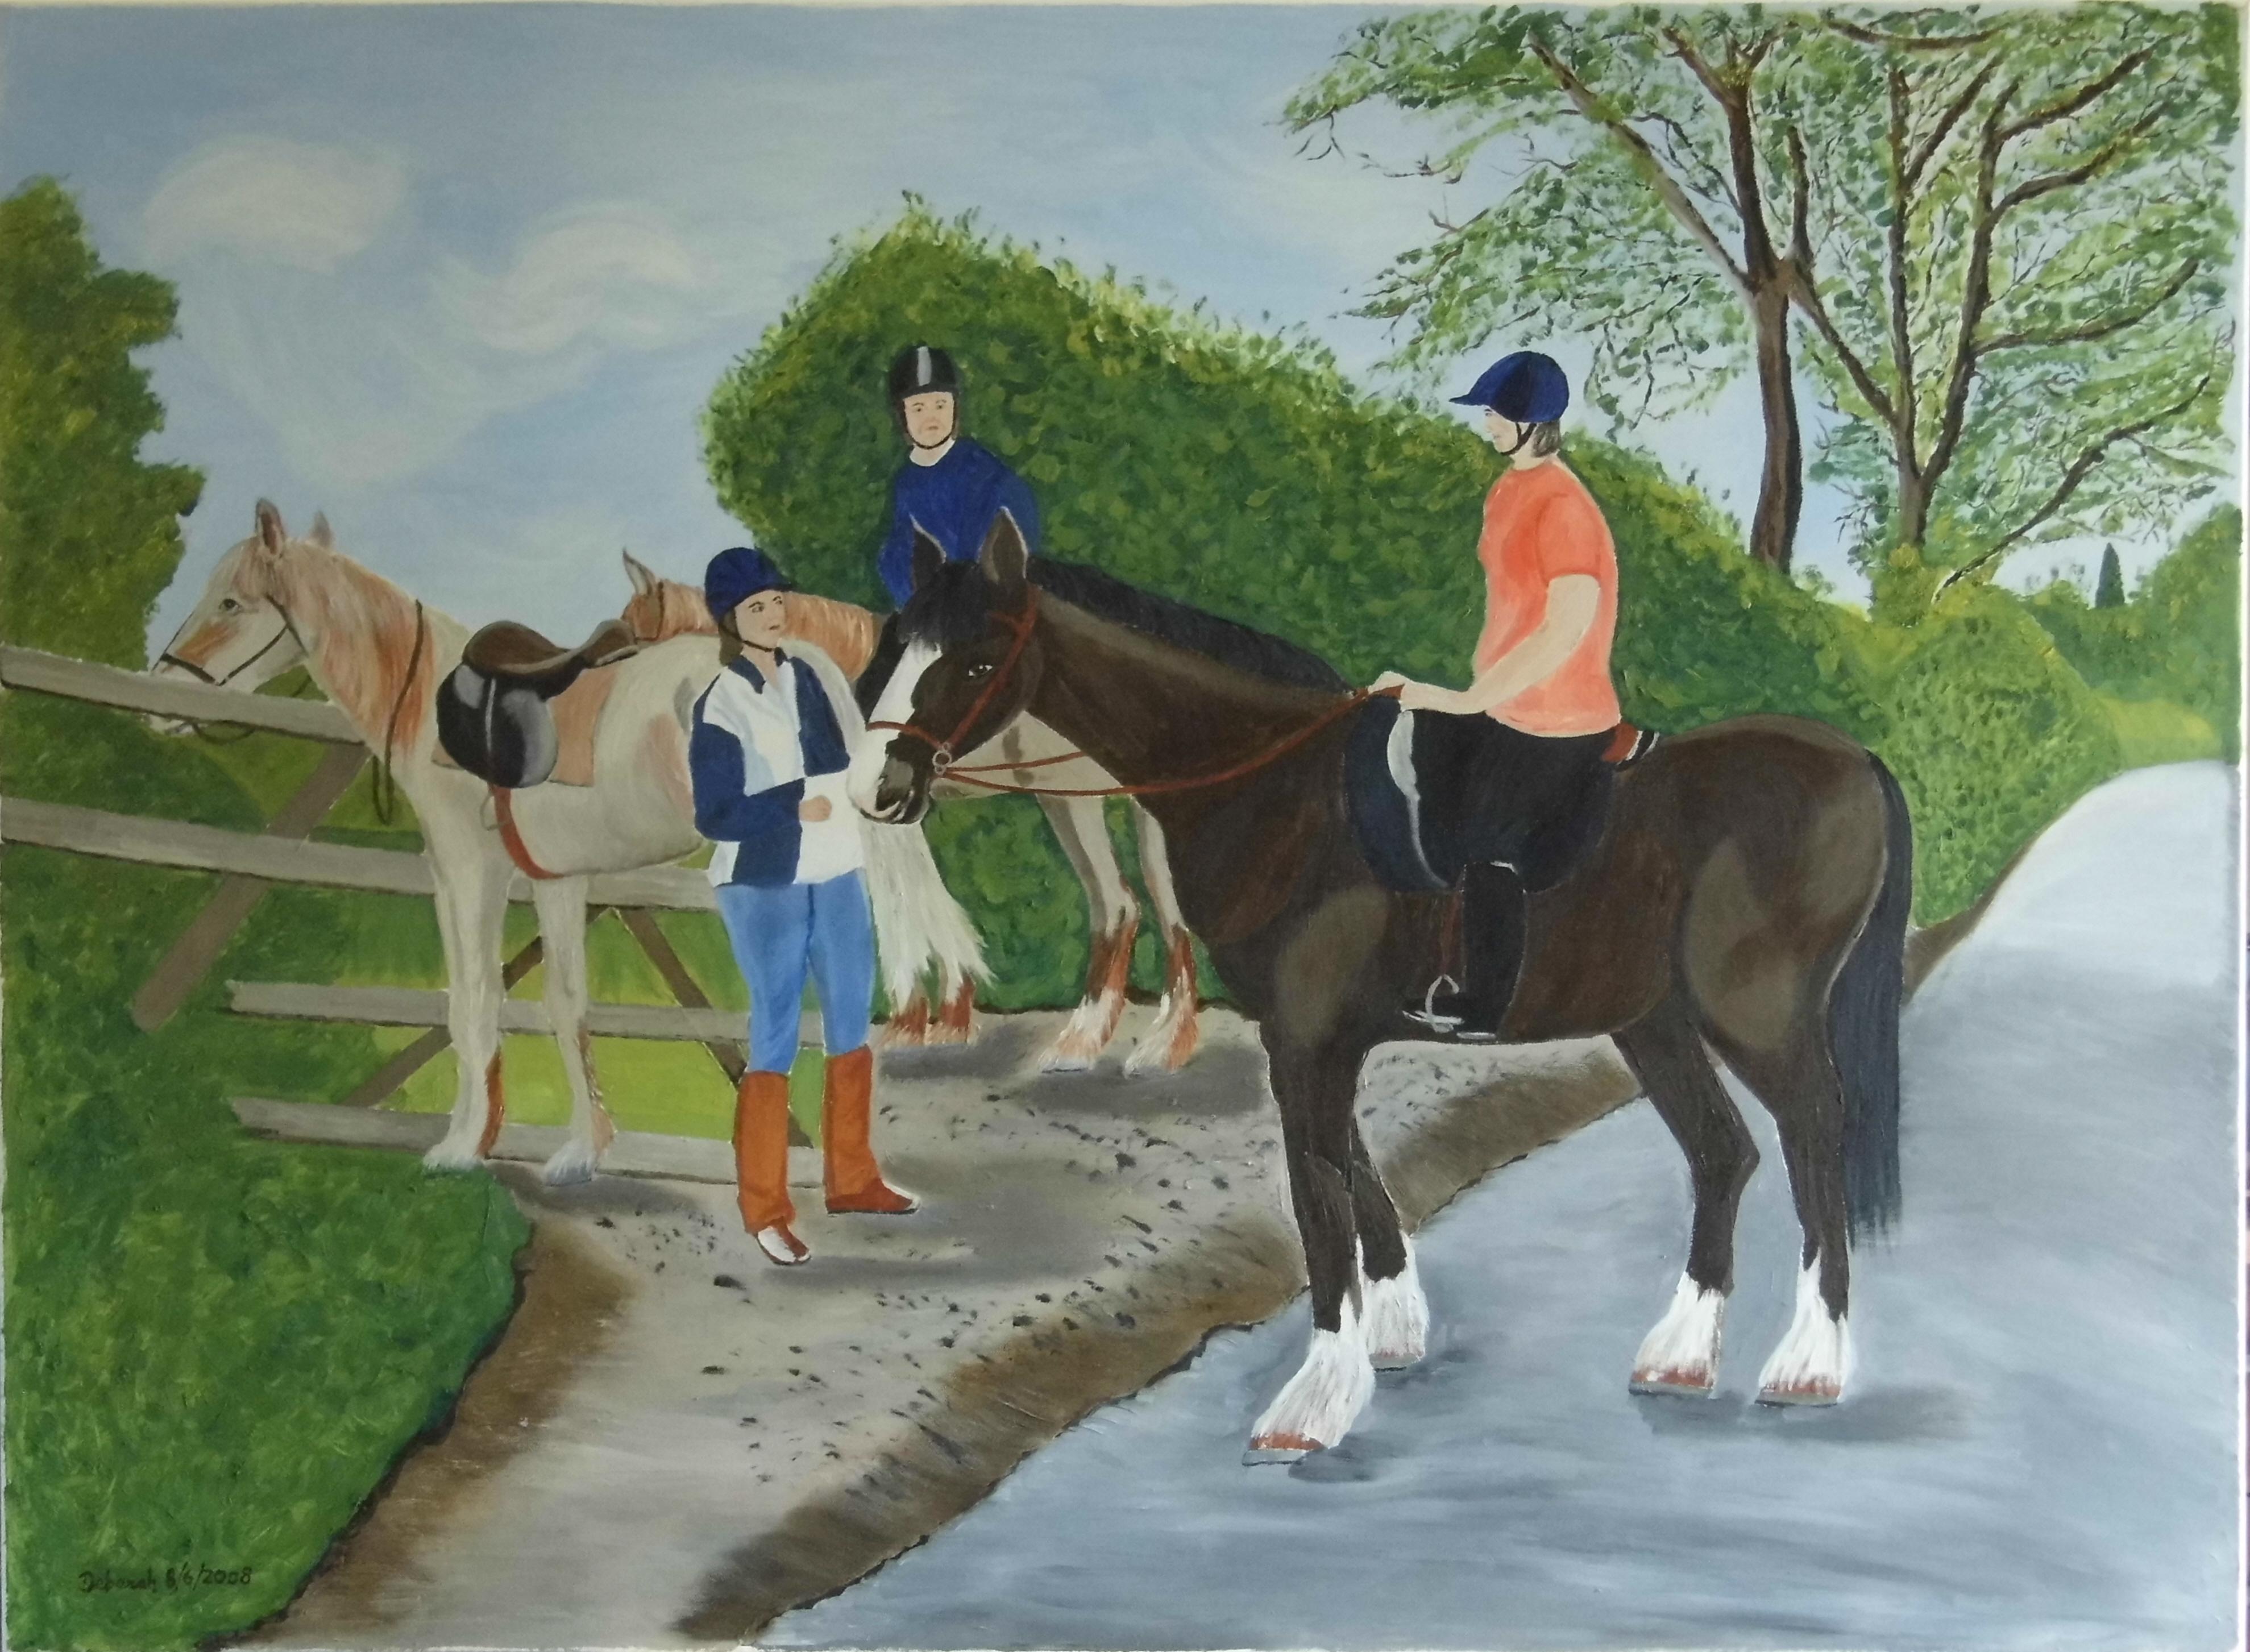 riders meeting artwork by teresa deborah ryle - art listed for sale on Artplode